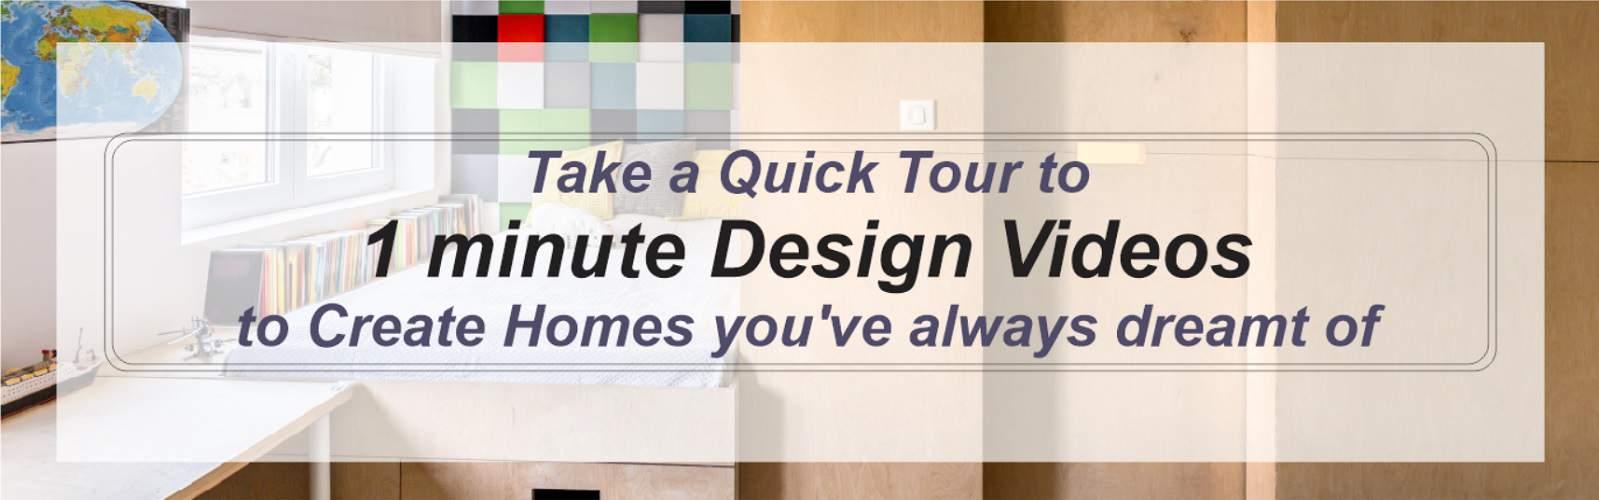 Design-Videos-Page-Image